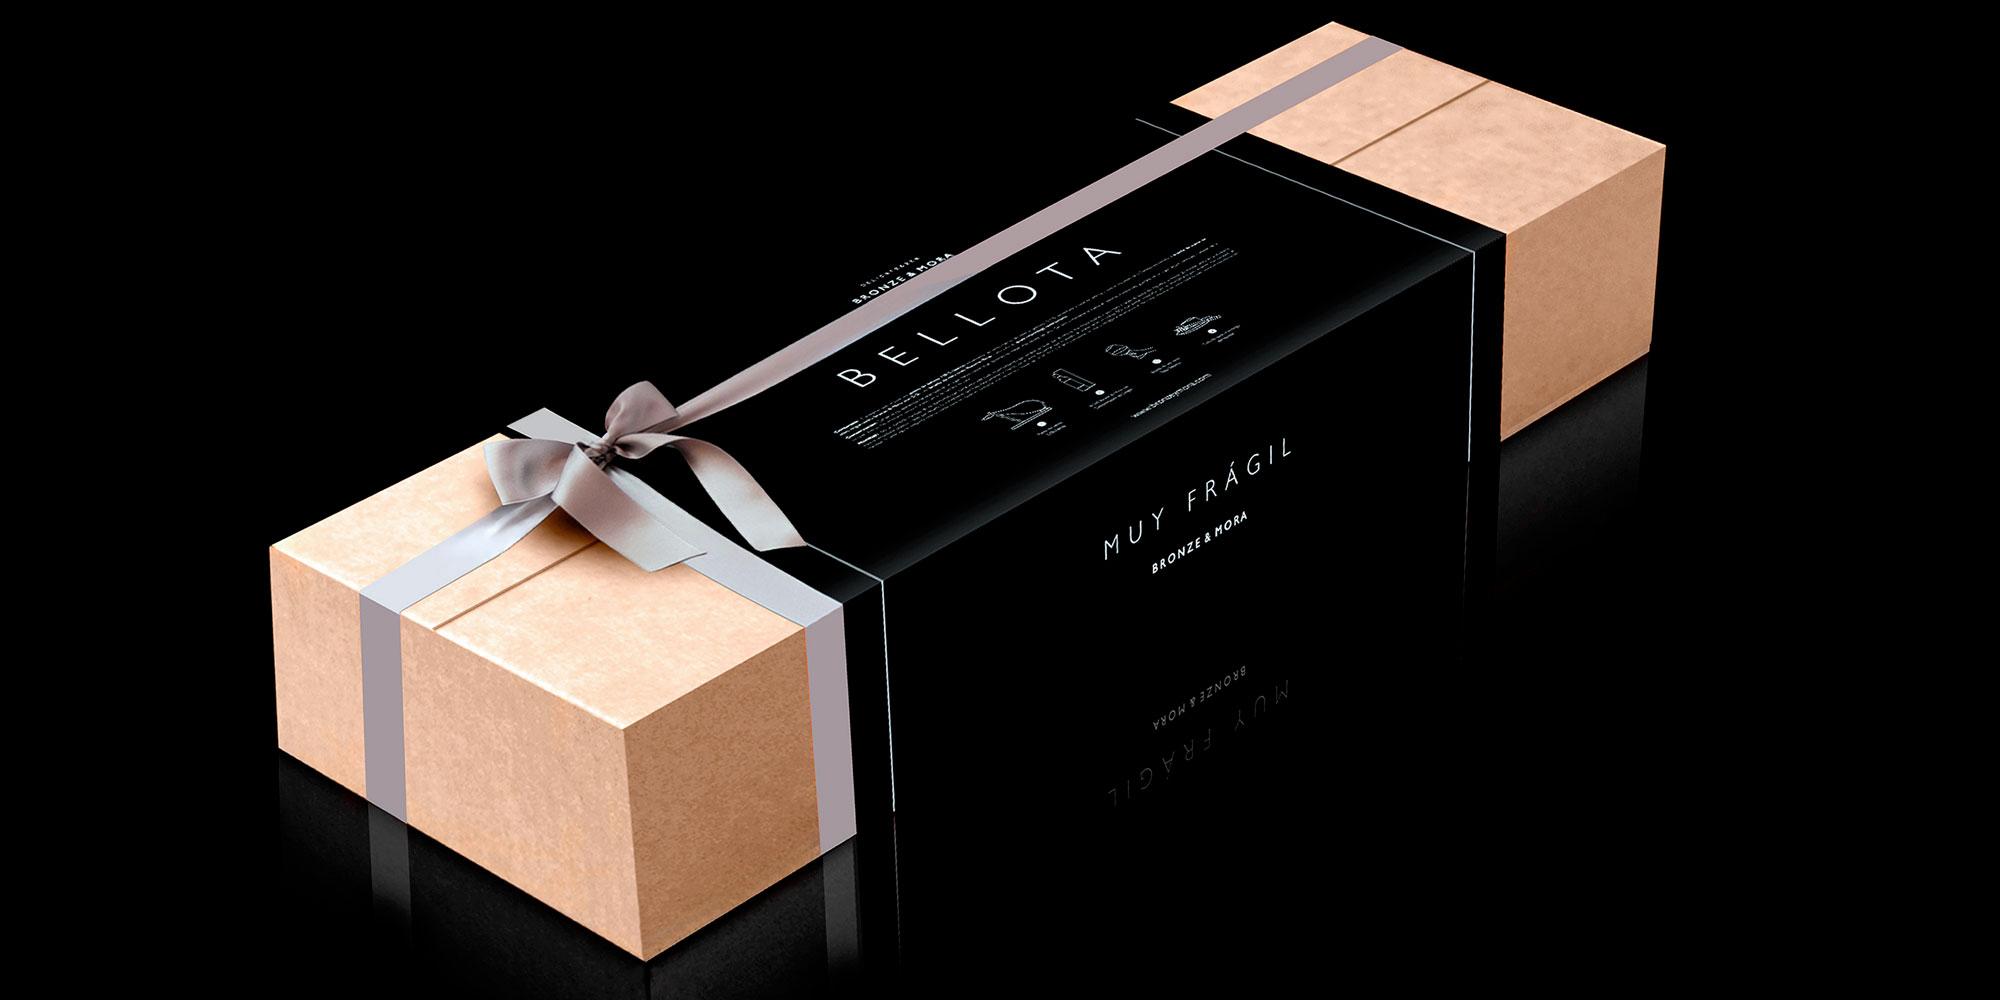 paleta-iberica-de-bellota-para-regalar-gourmet-corporativo-de-empresa-bronze-y-mora